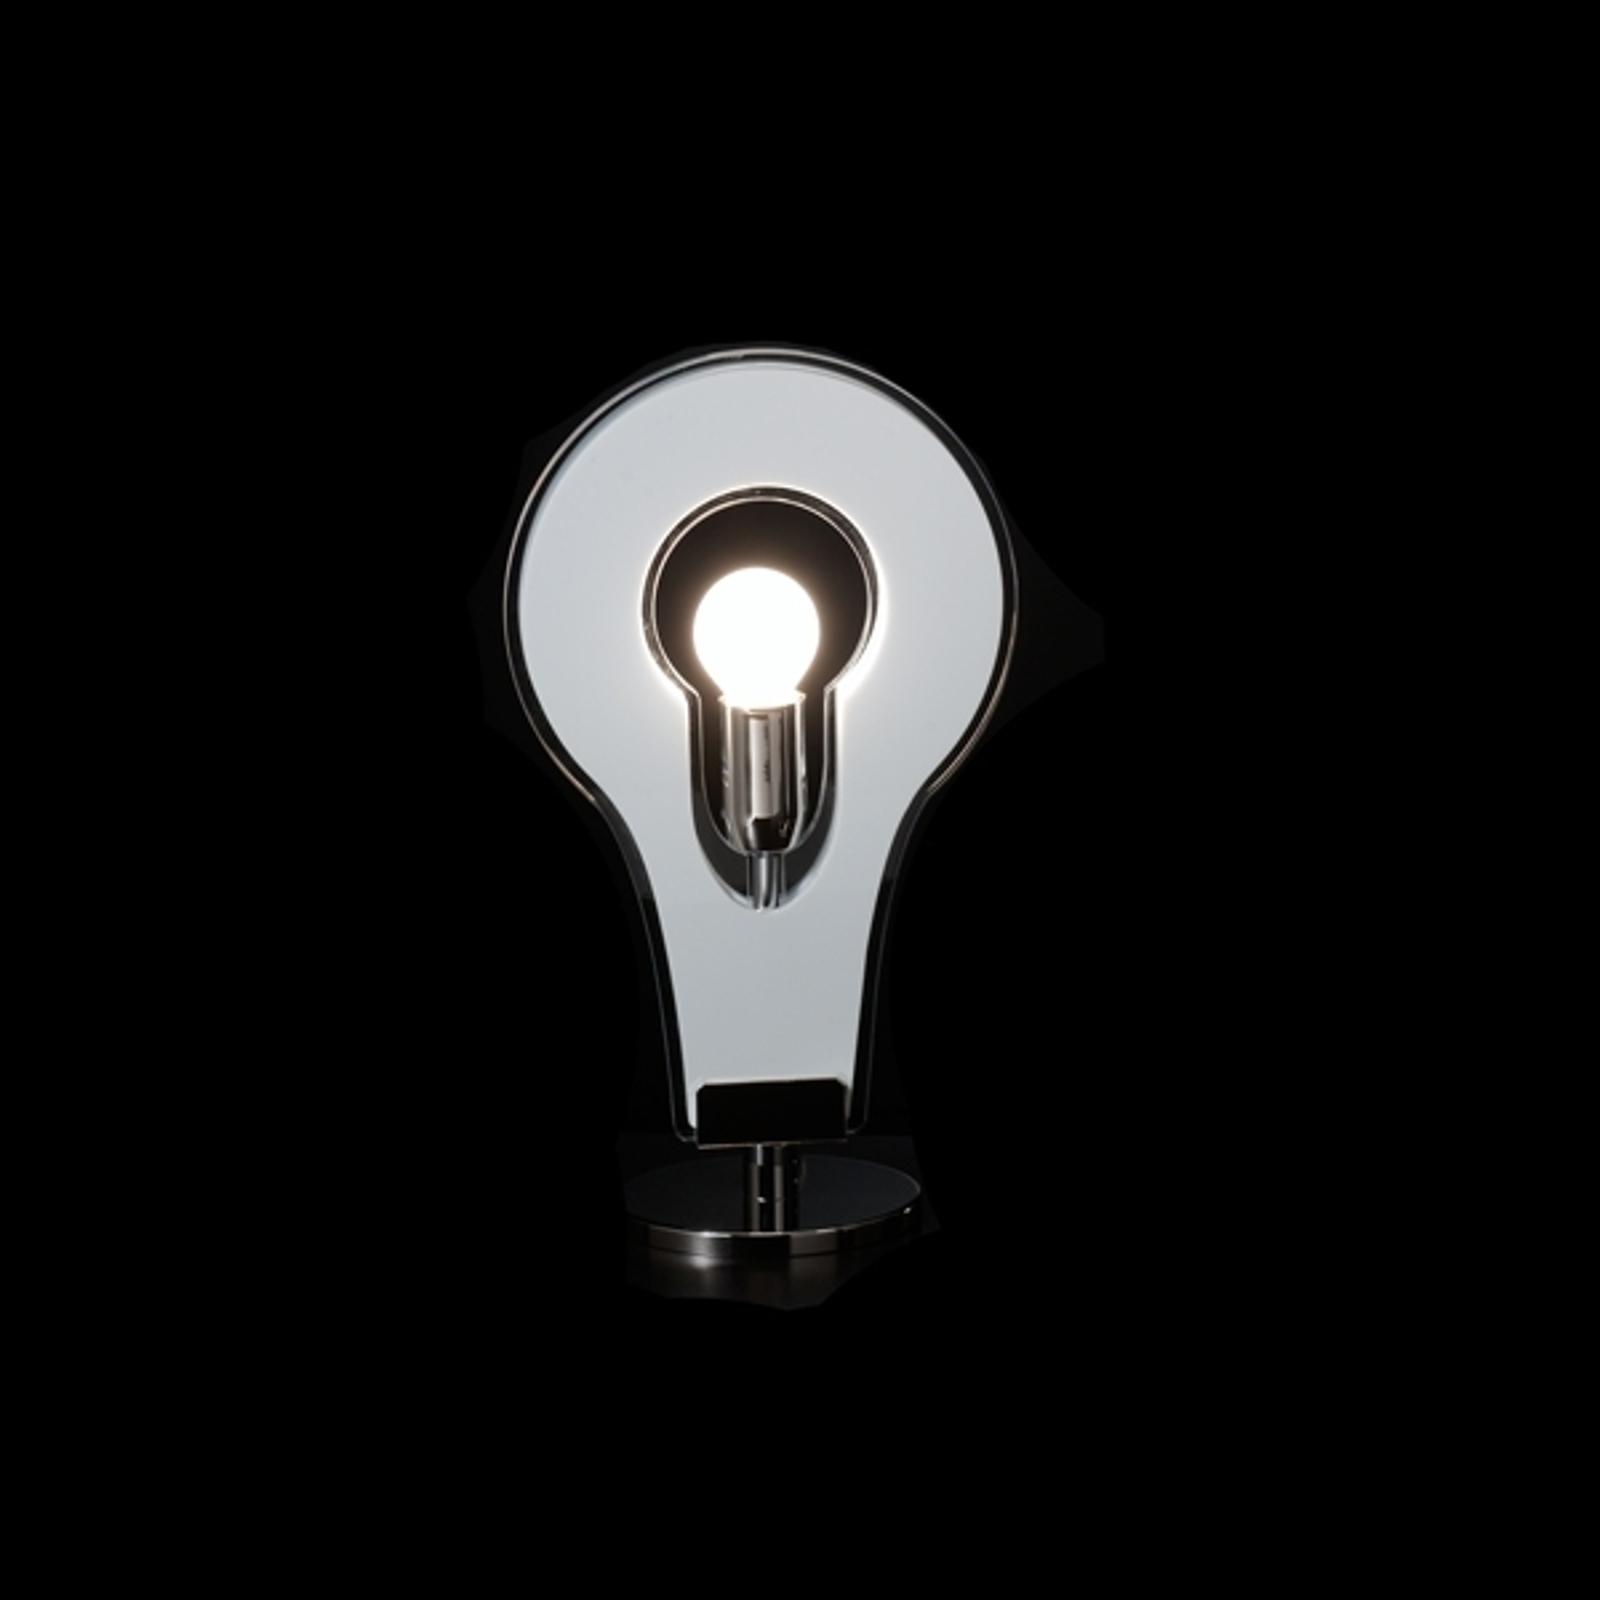 Imponente lampada da tavolo Flat, 32cm, bianca